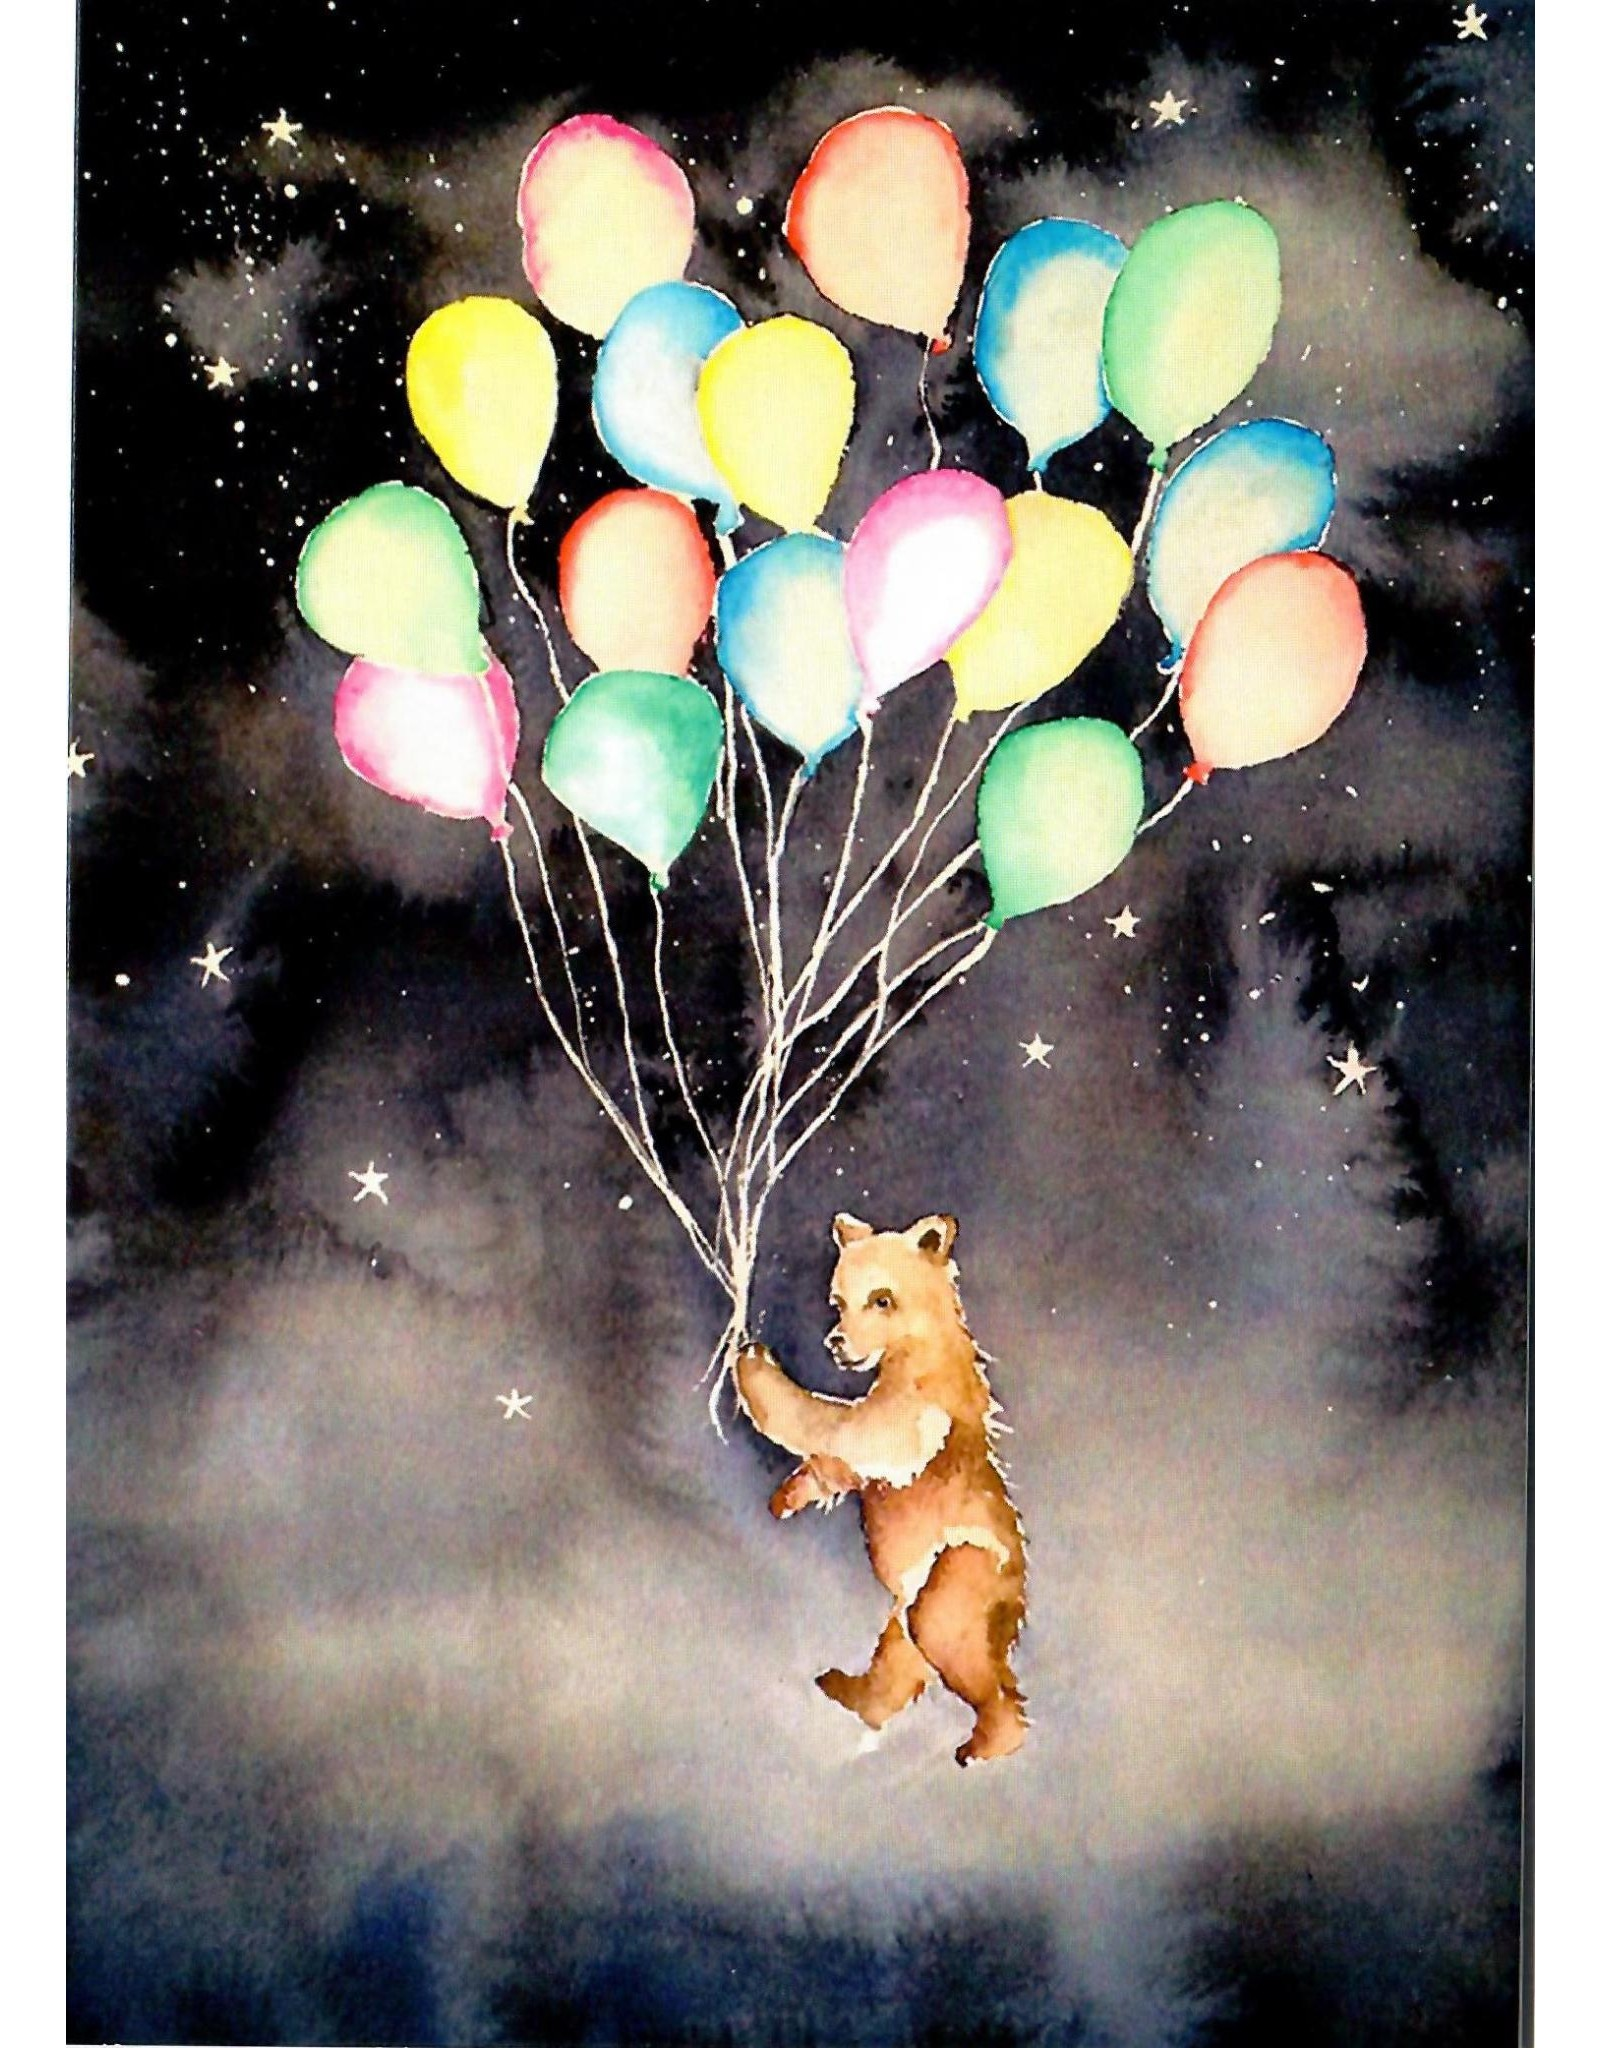 Scanlon, Rosemary Balloon Bear - greeting card (blank)